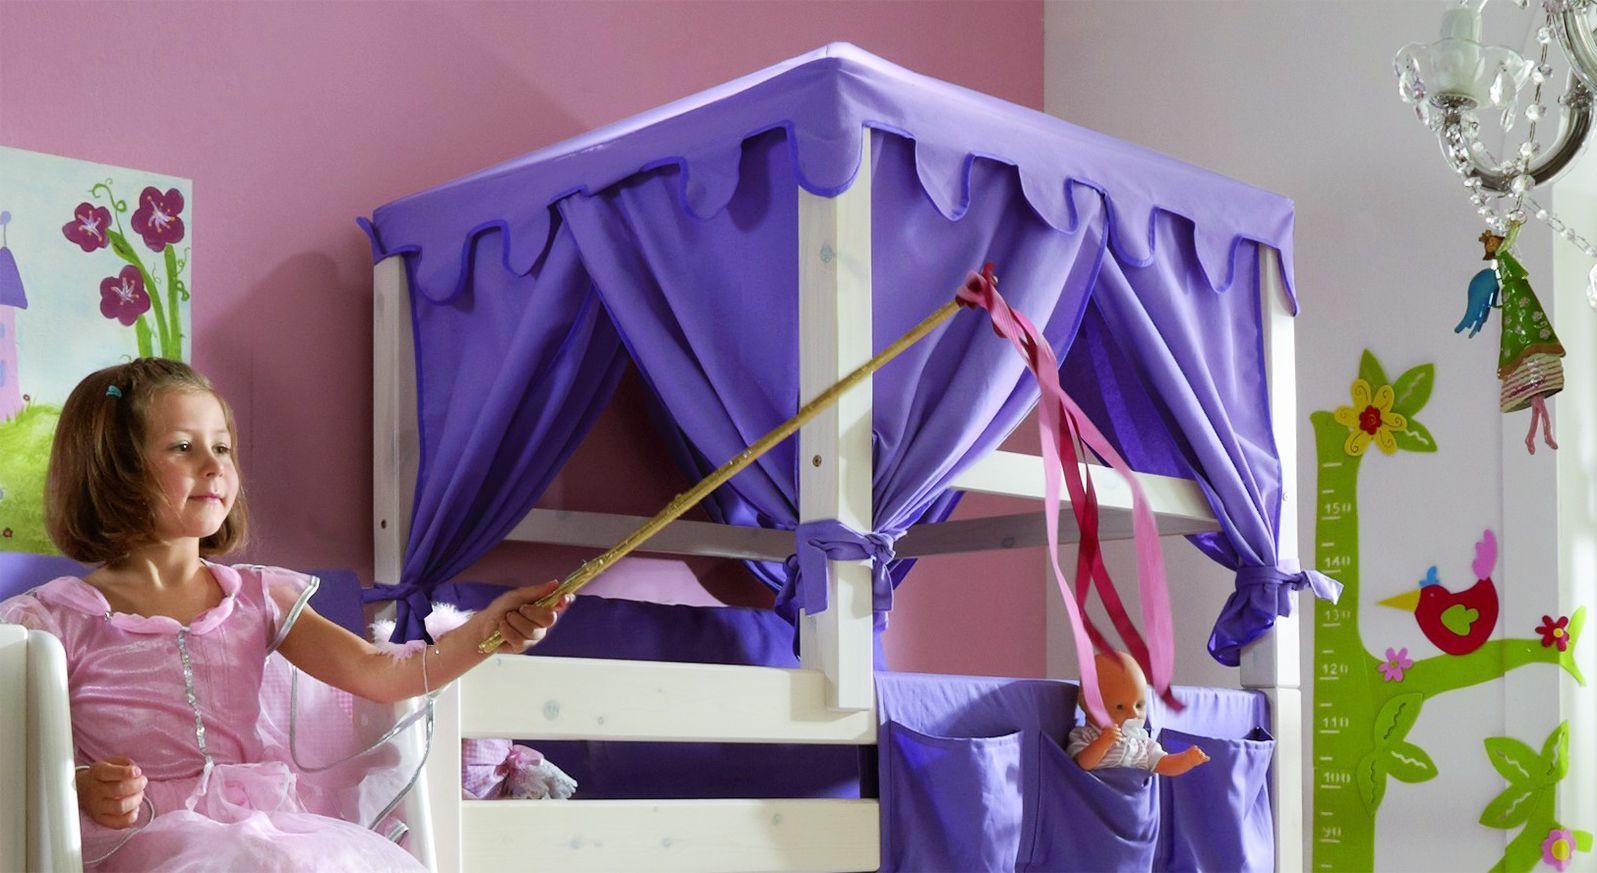 Kinder-Hochbett Kids Paradise mit Himmelaufsatz